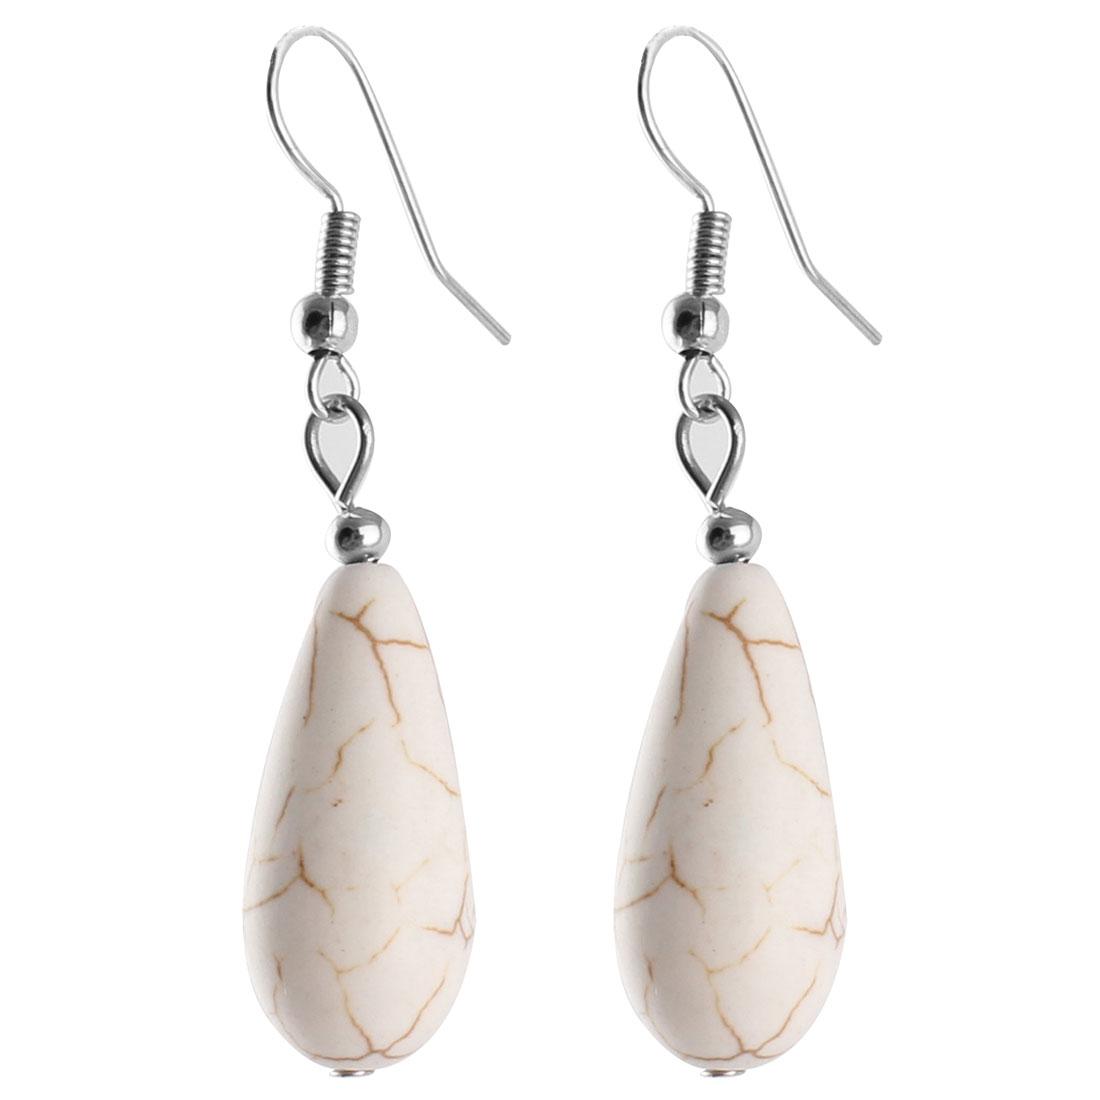 Pair Retro Style White Oval Plastic Bead Pendant Dangling Fish Hook Ear Drops Earrings Eardrops